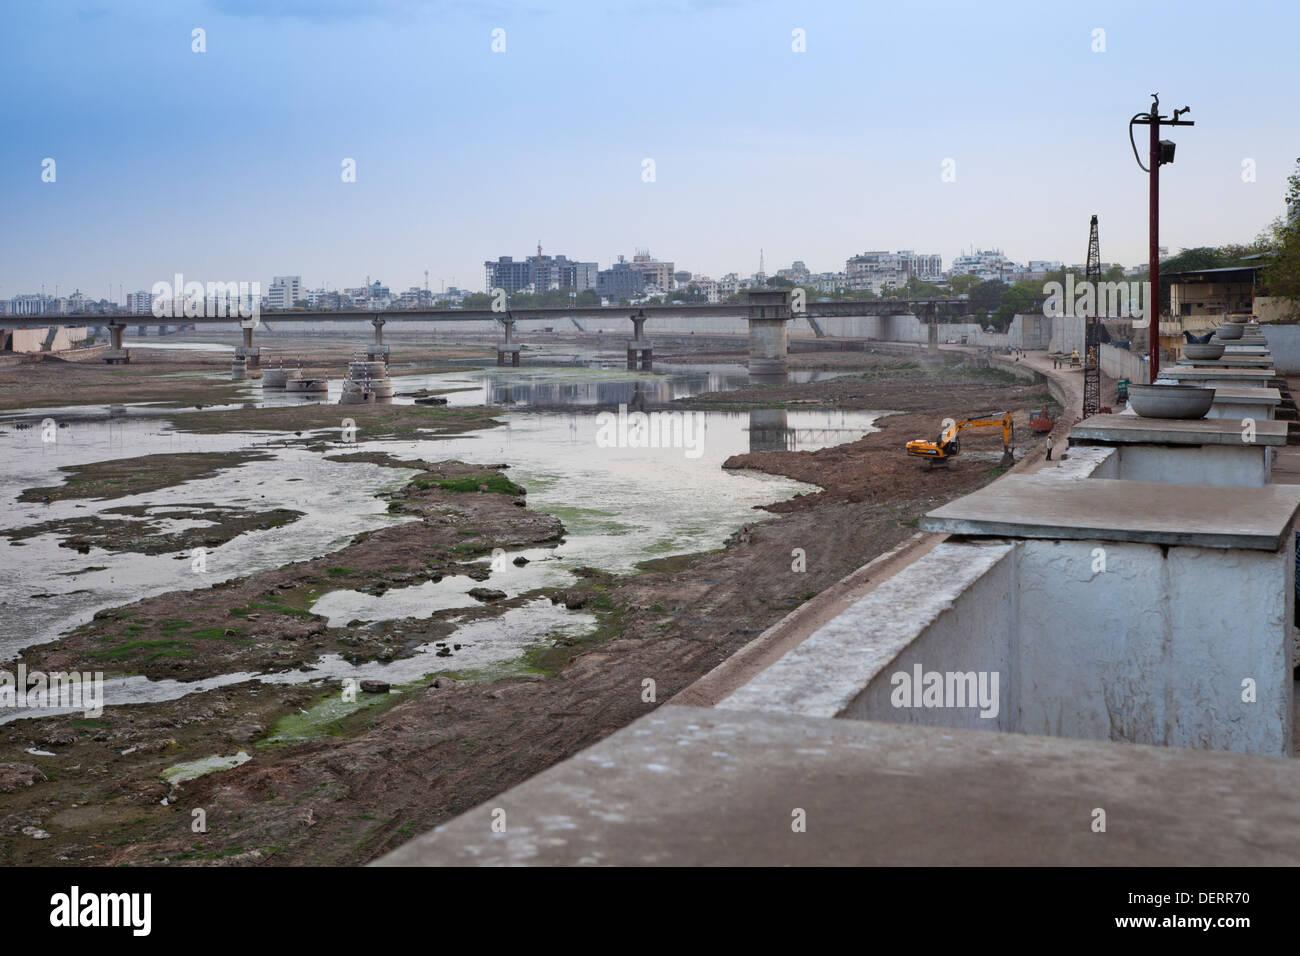 Sabarmati Riverfront, Ahmedabad, Gujarat, India Stock Photo